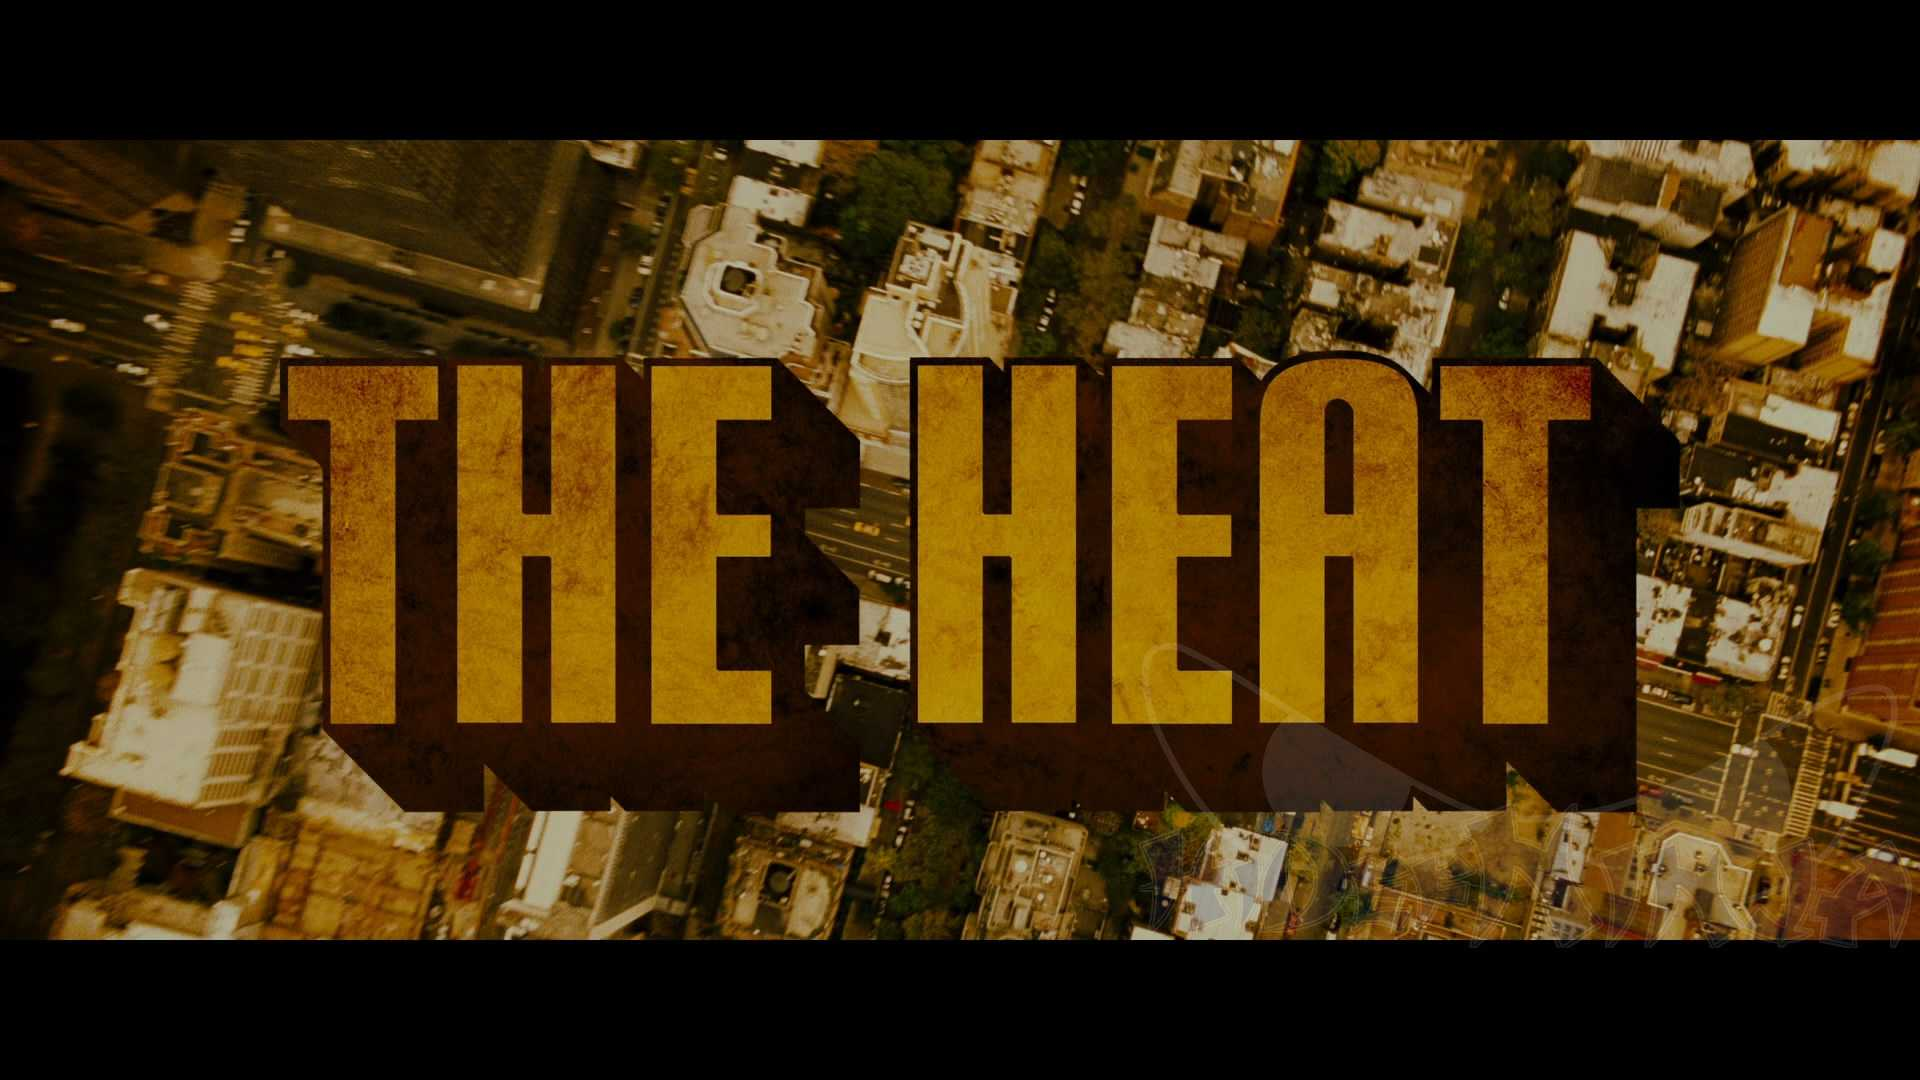 TheHeat-1